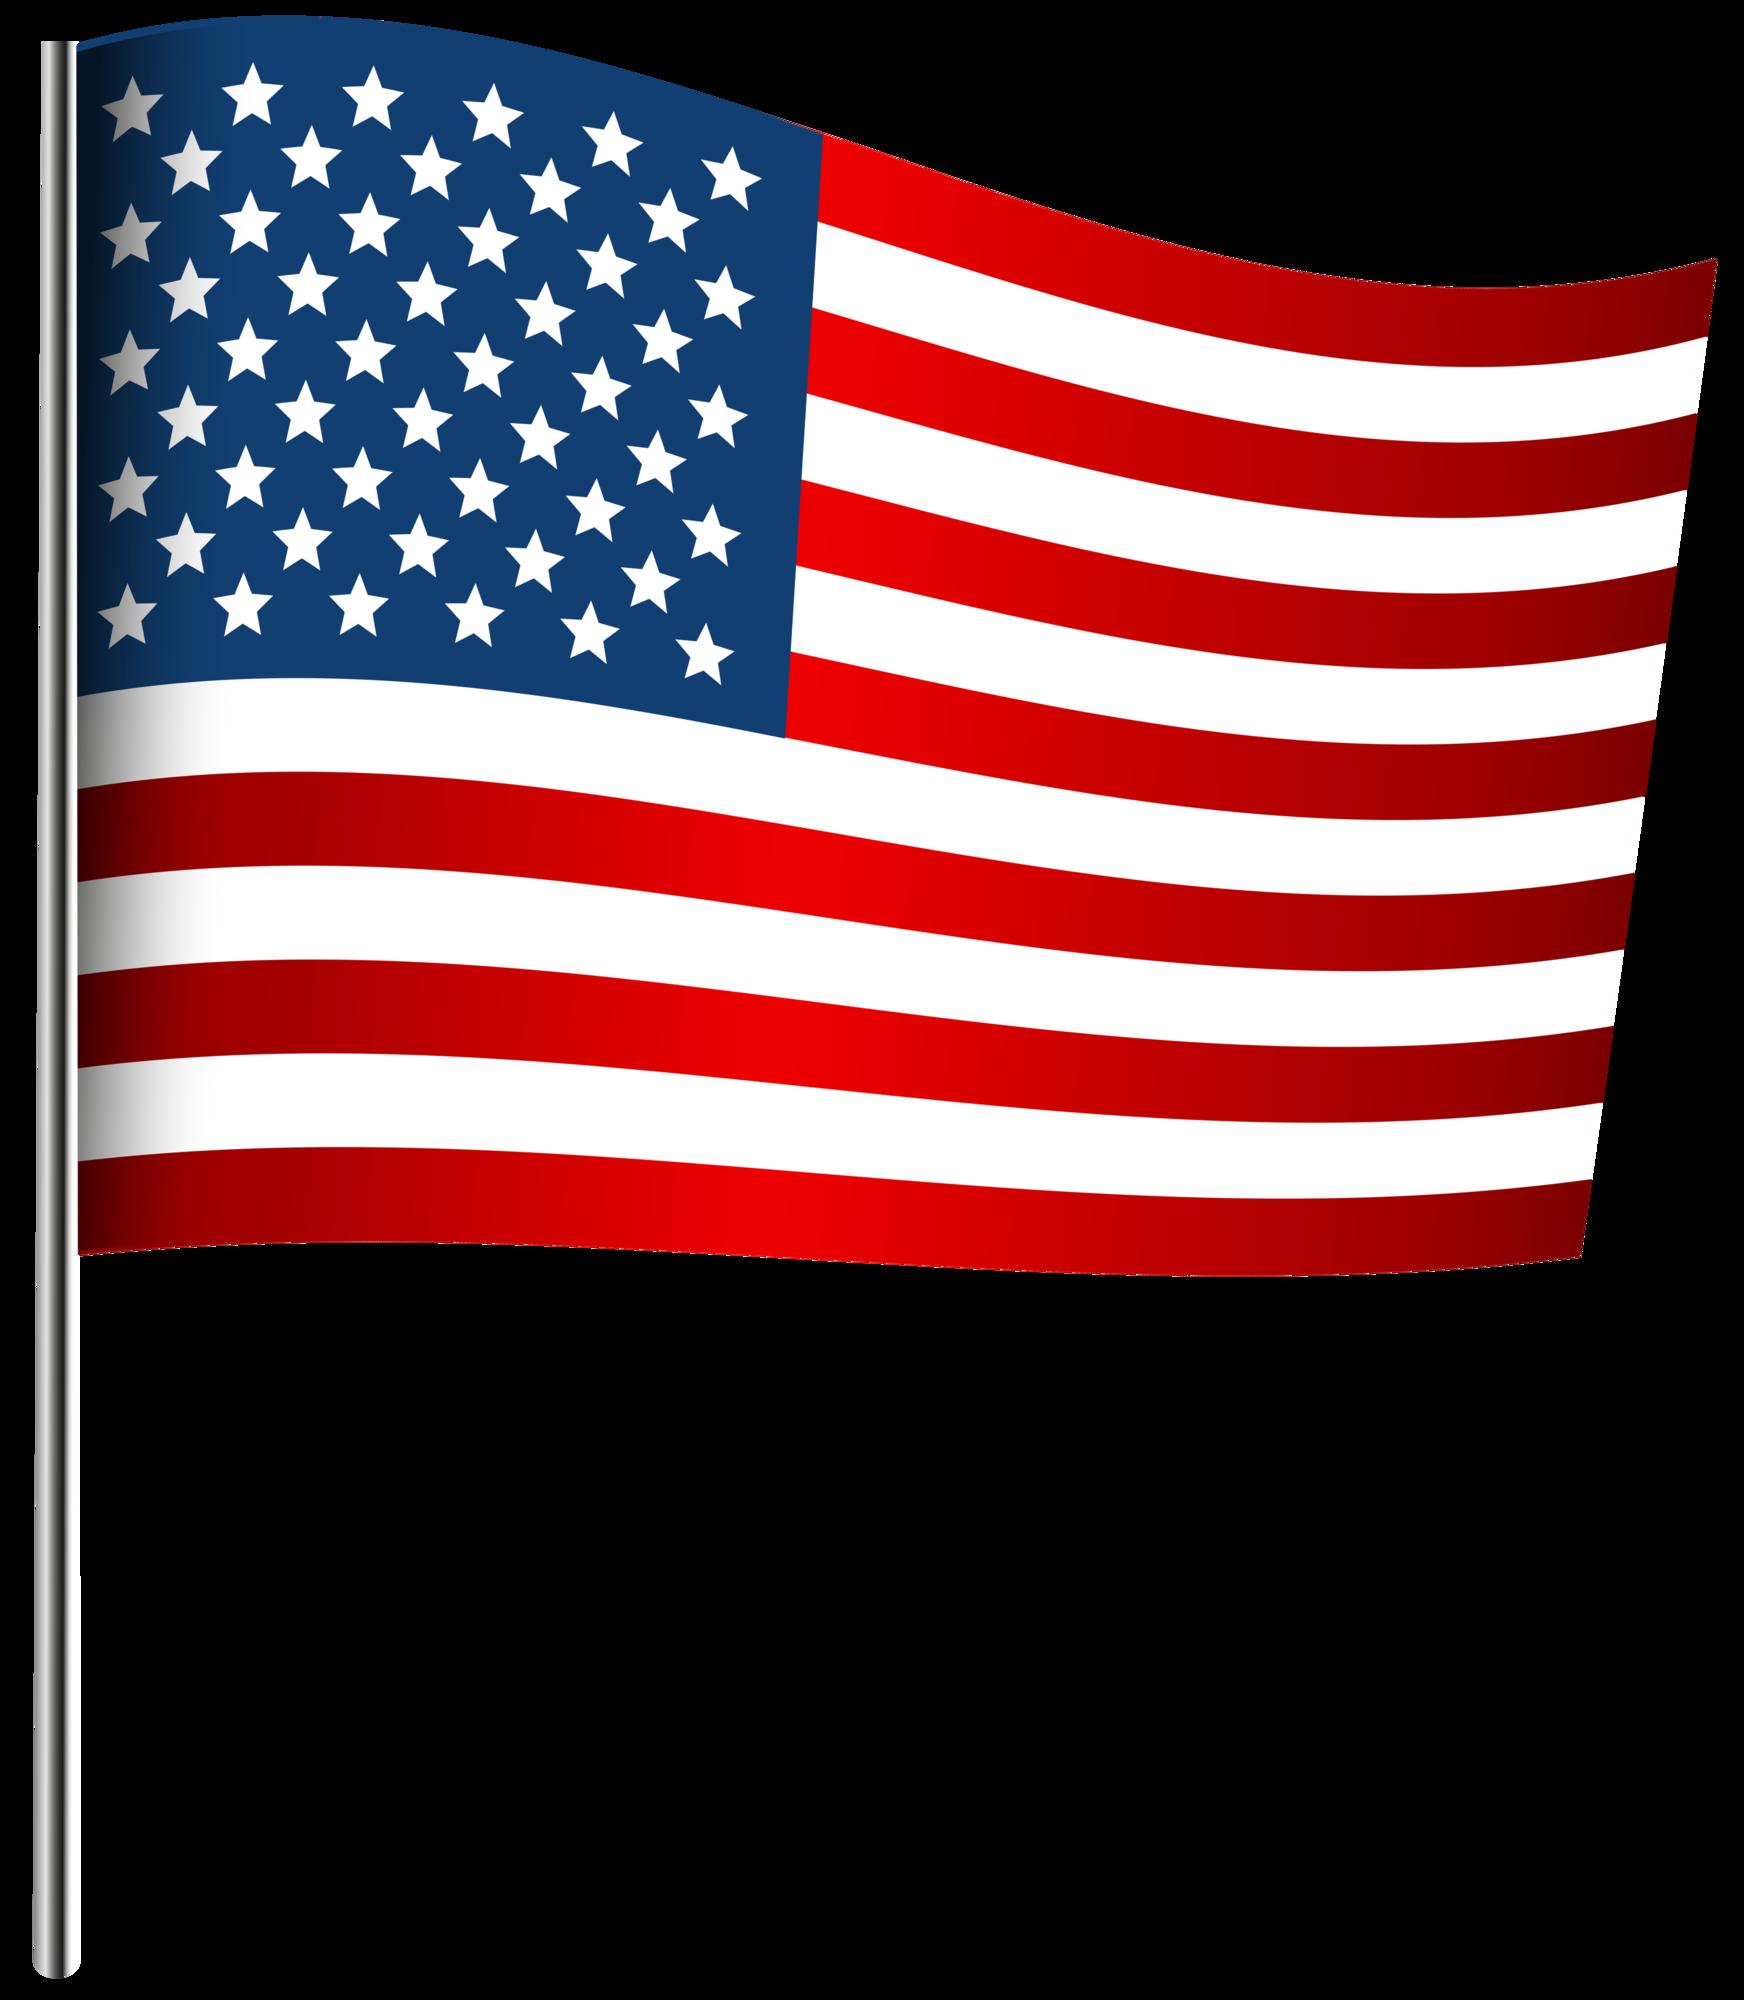 American Waving Flag PNG Clip Art Image